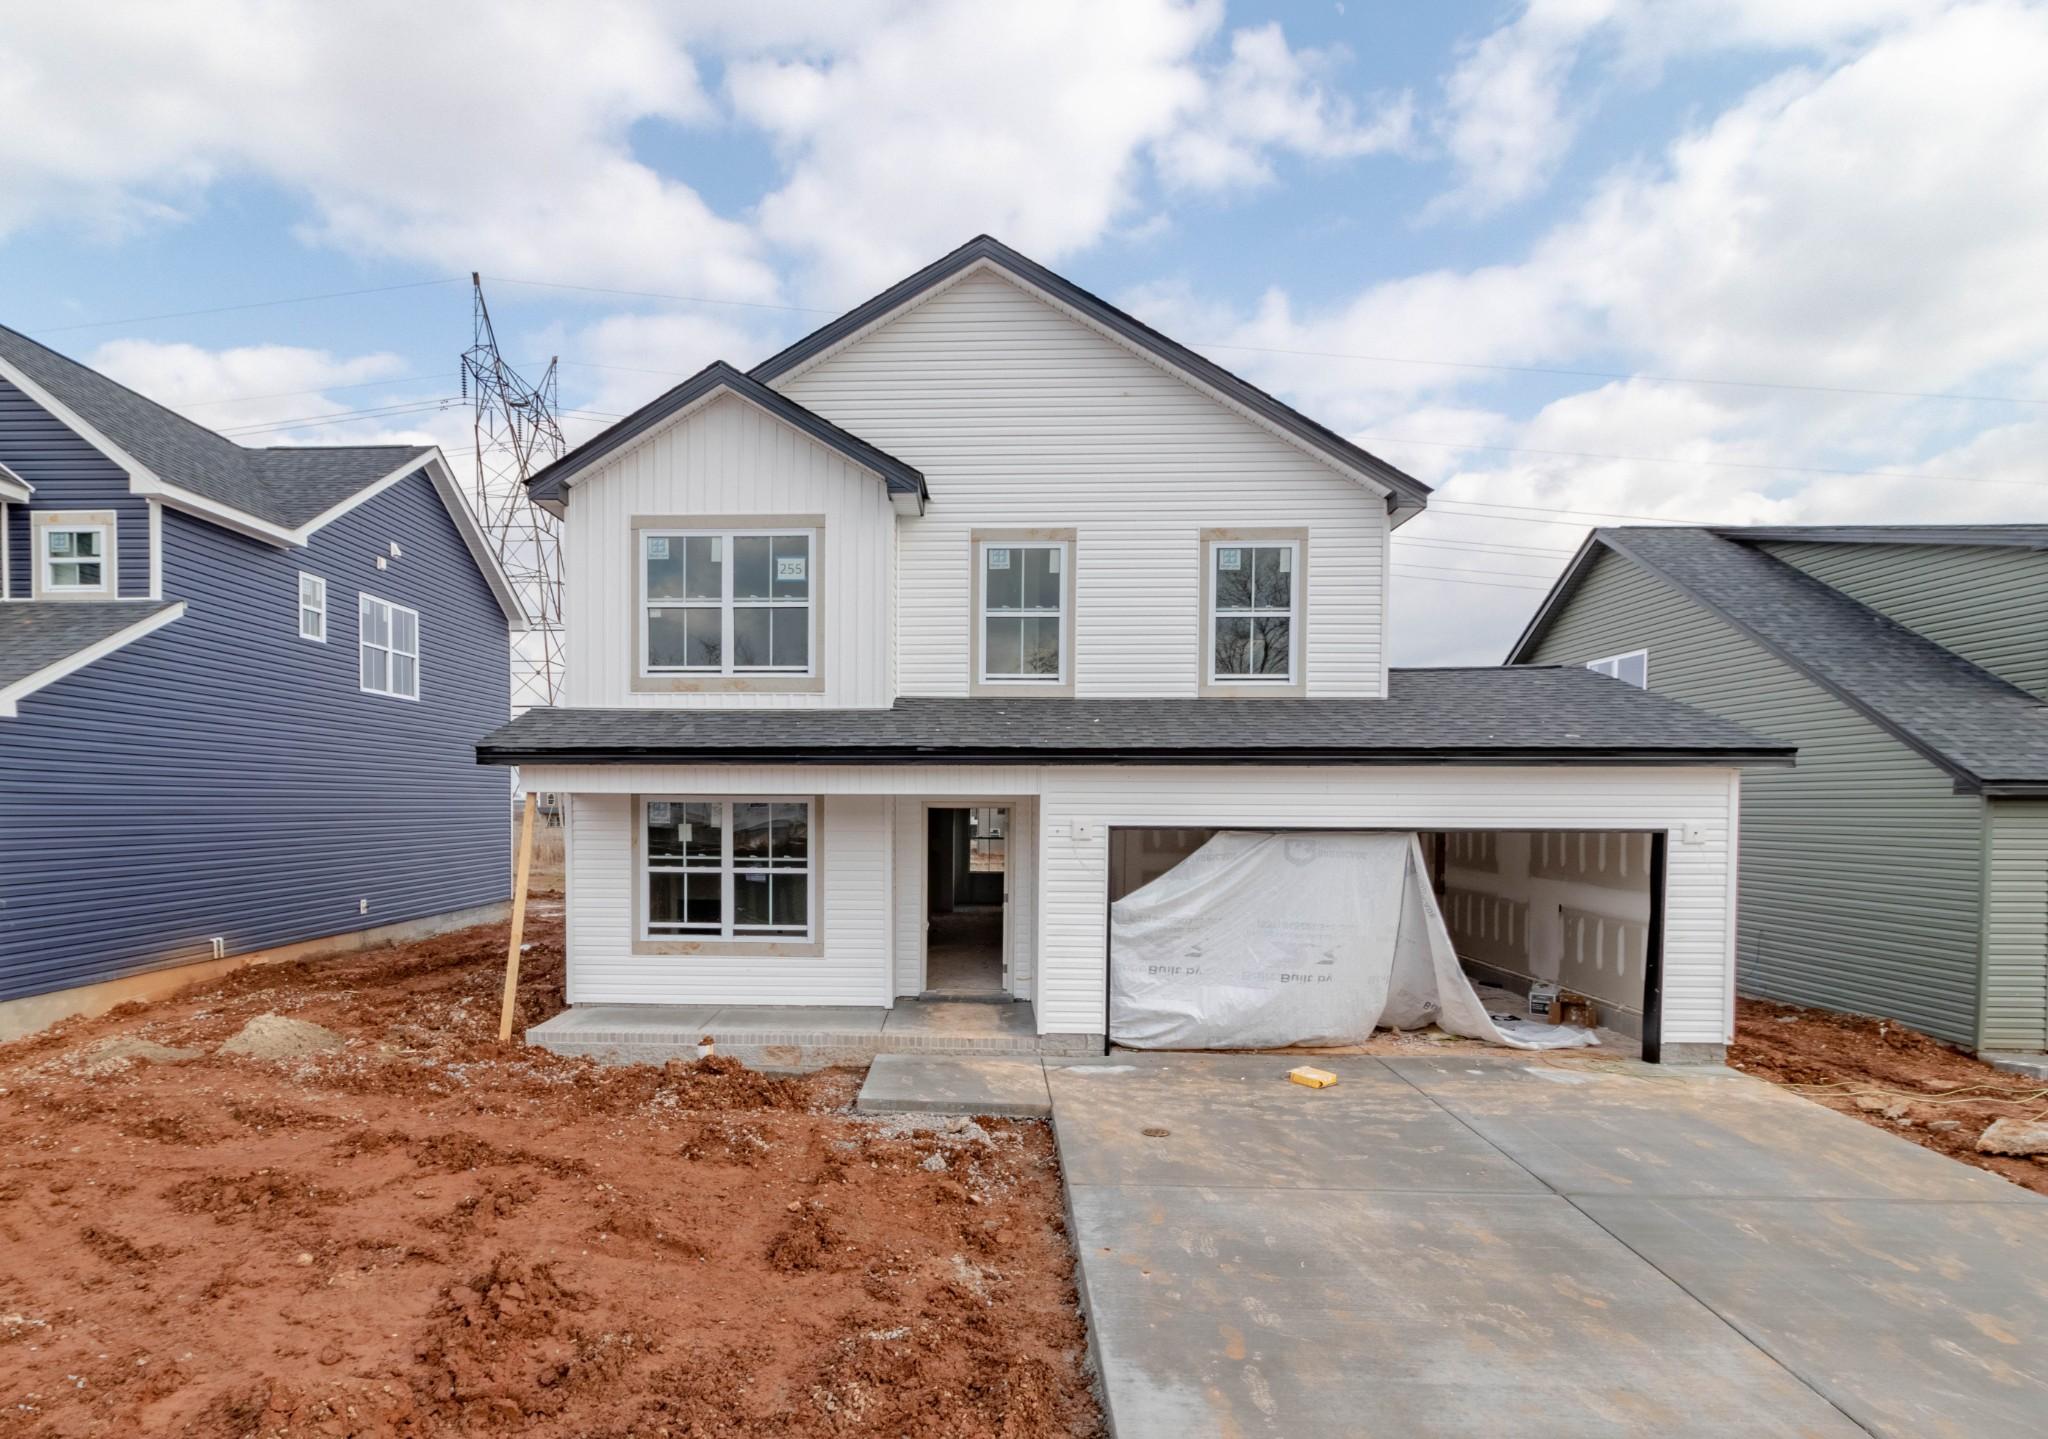 255 White Tail Ridge, Clarksville, TN 37040 - Clarksville, TN real estate listing